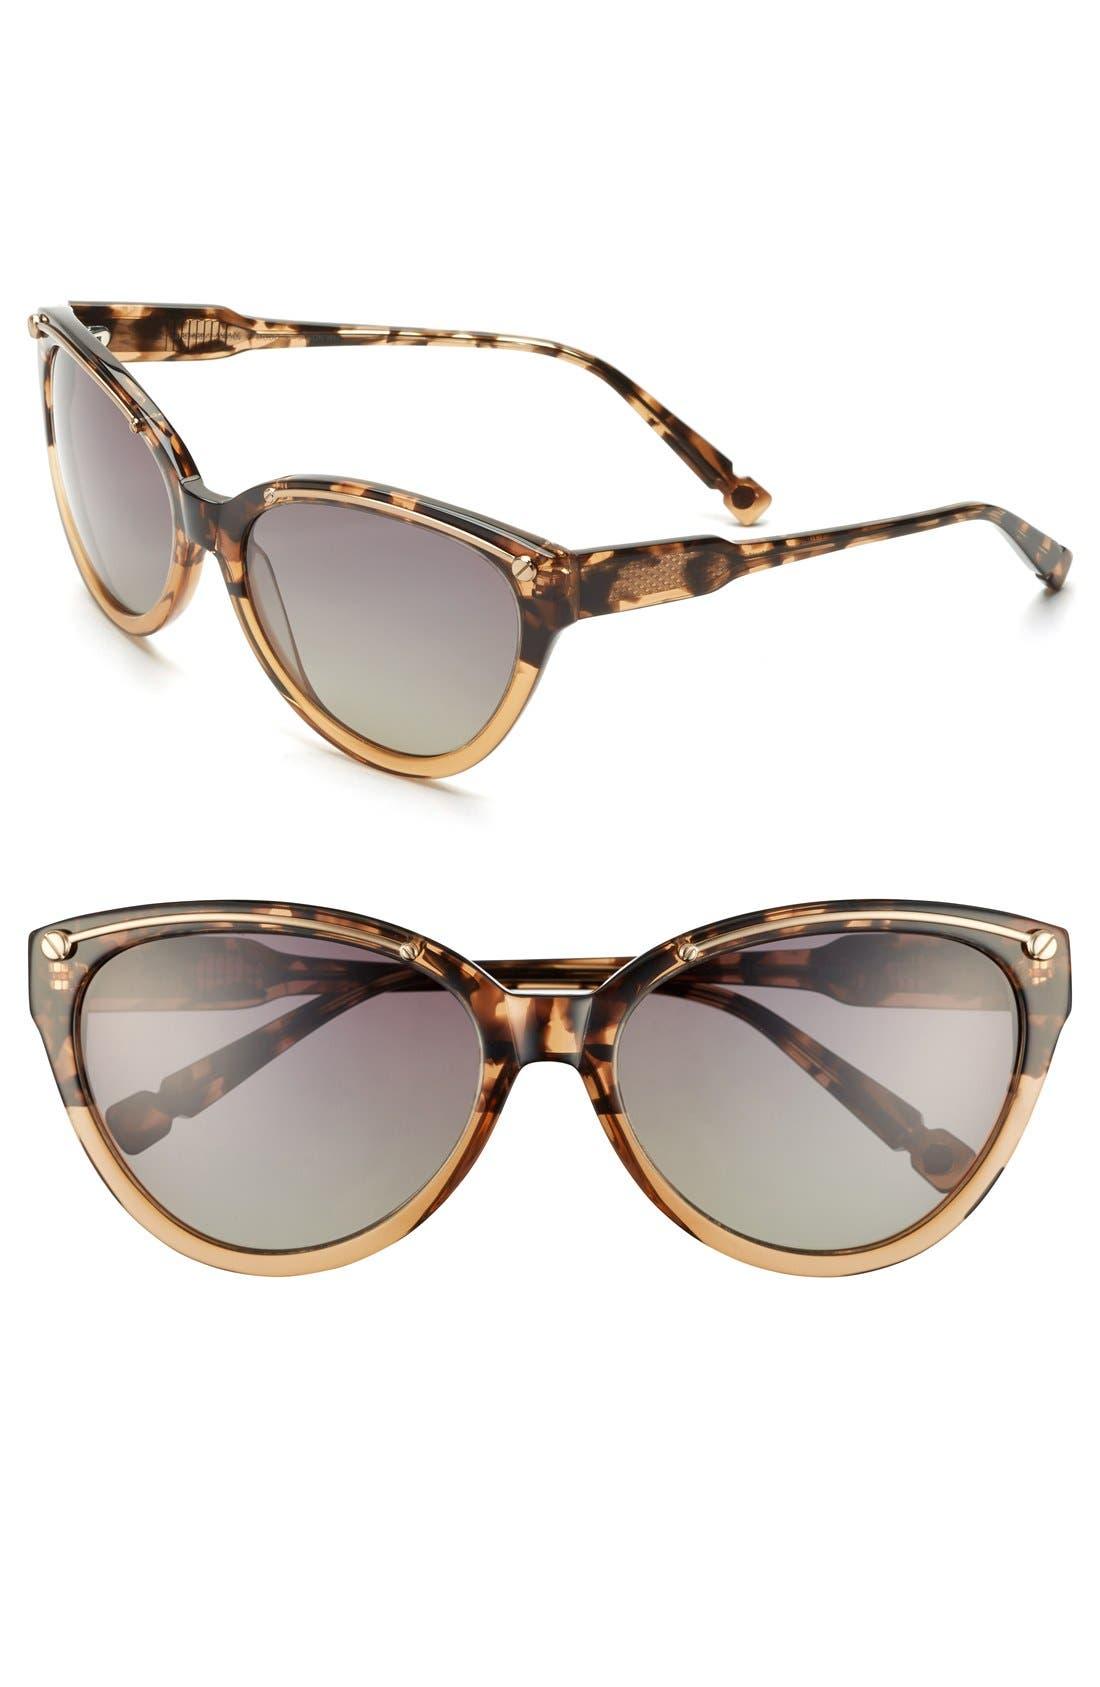 Alternate Image 1 Selected - Jason Wu 'Anais' 58mm Sunglasses